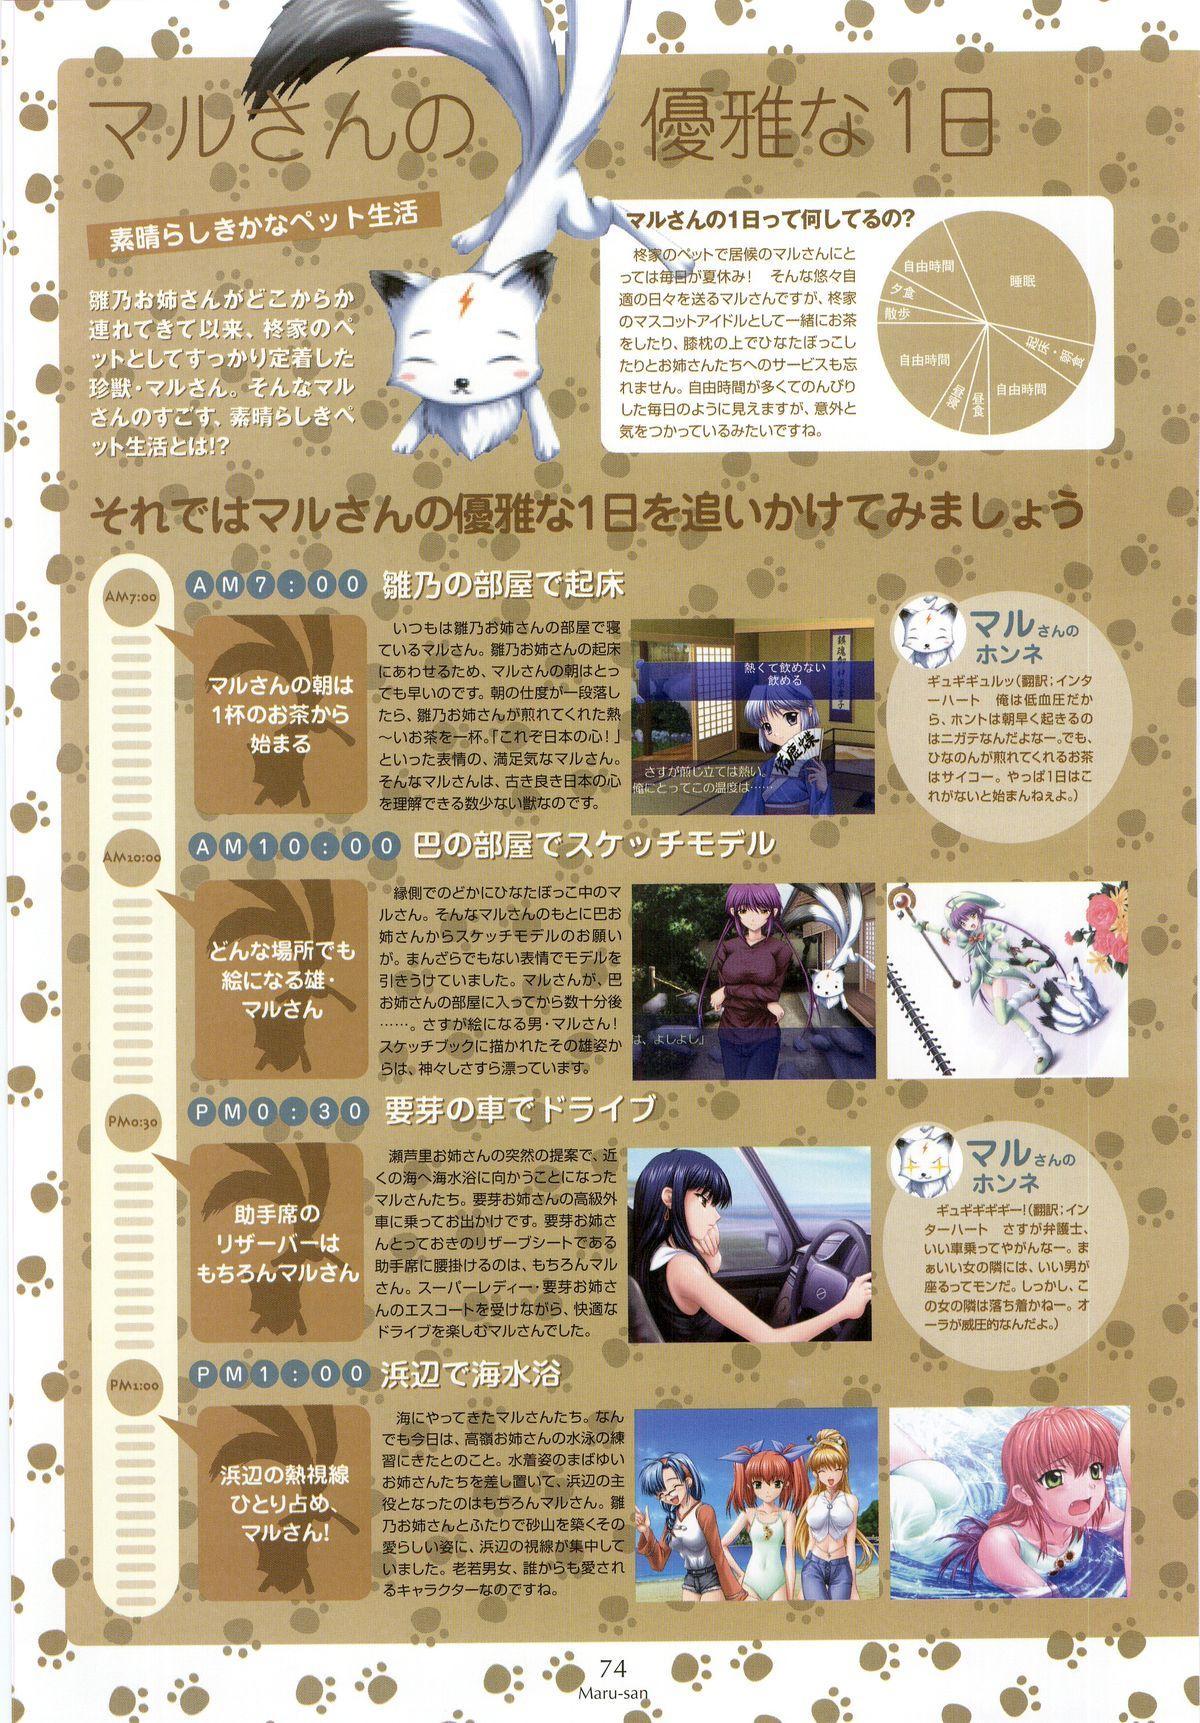 Nee, Chan to Shiyou yo! Koushiki Fanbook - Ai to Batou no Hibi 65